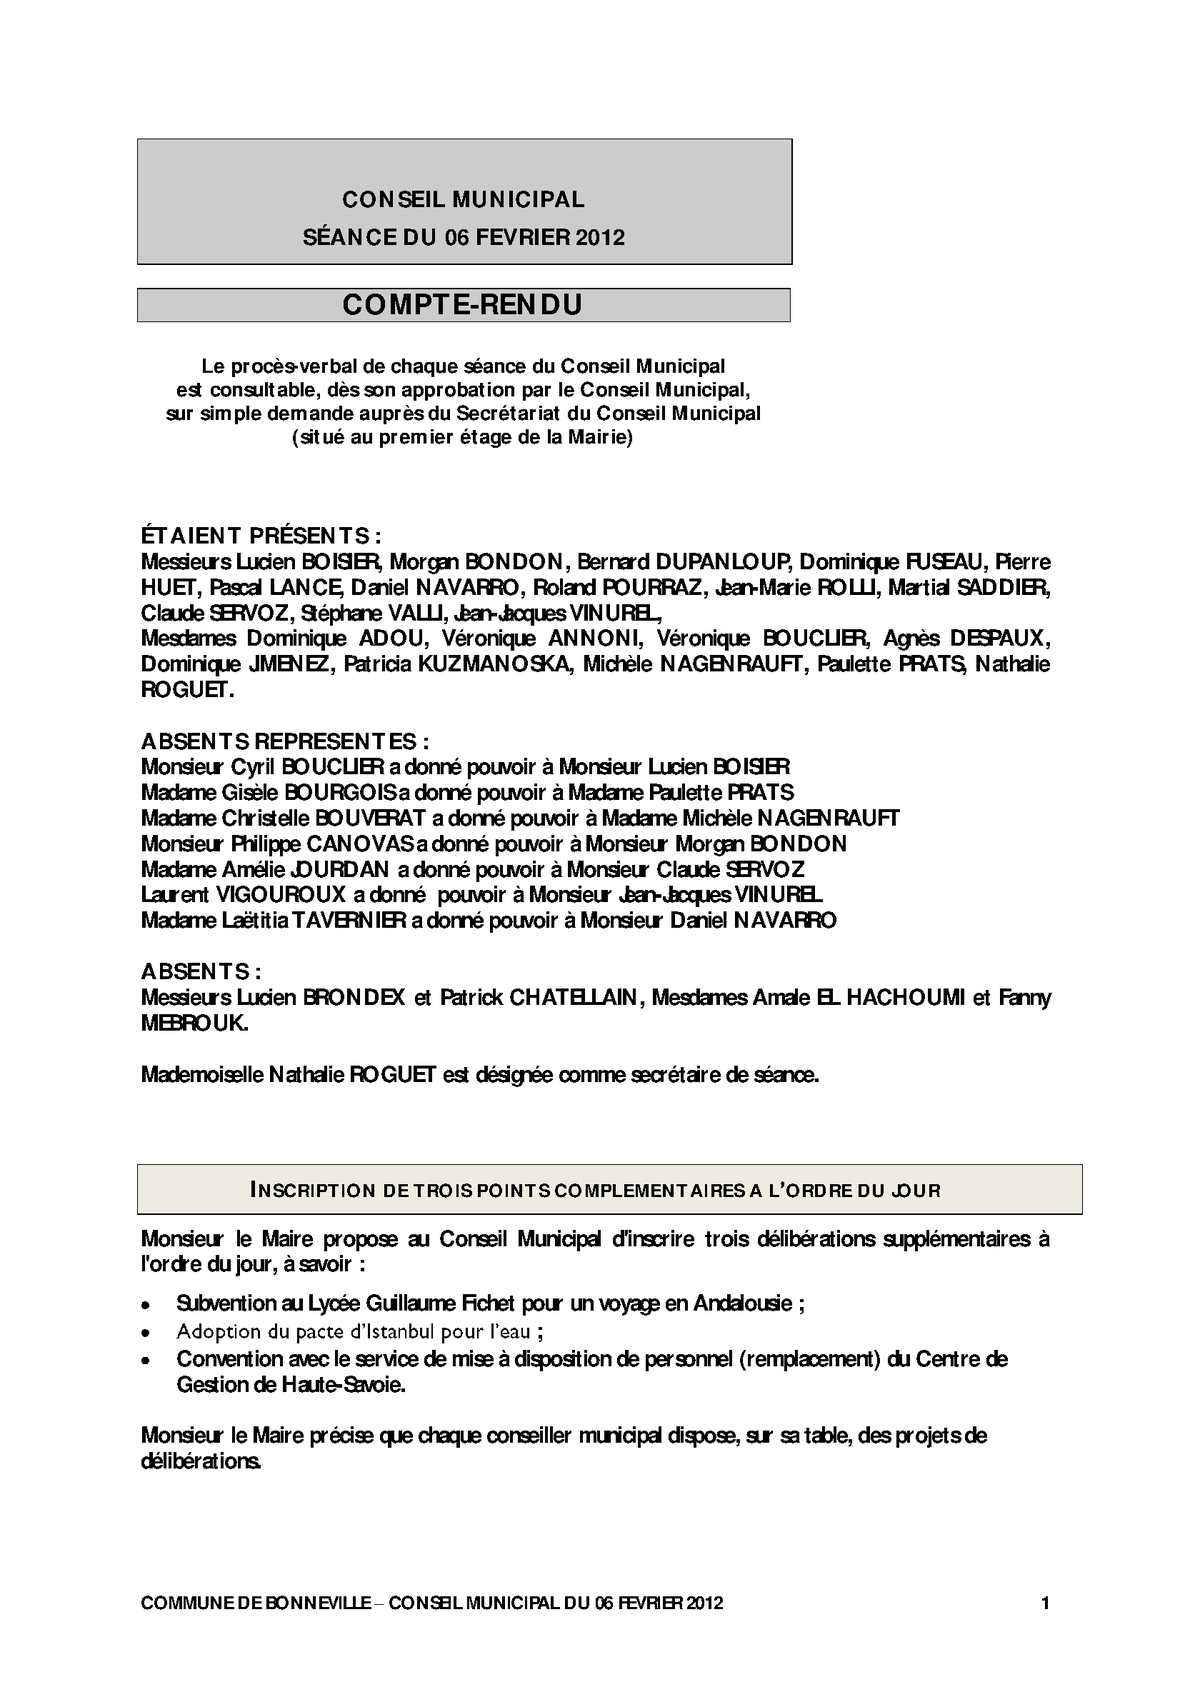 559a7e1b7b7 Calaméo - Compte-rendu du conseil municipal du 6 février 2012